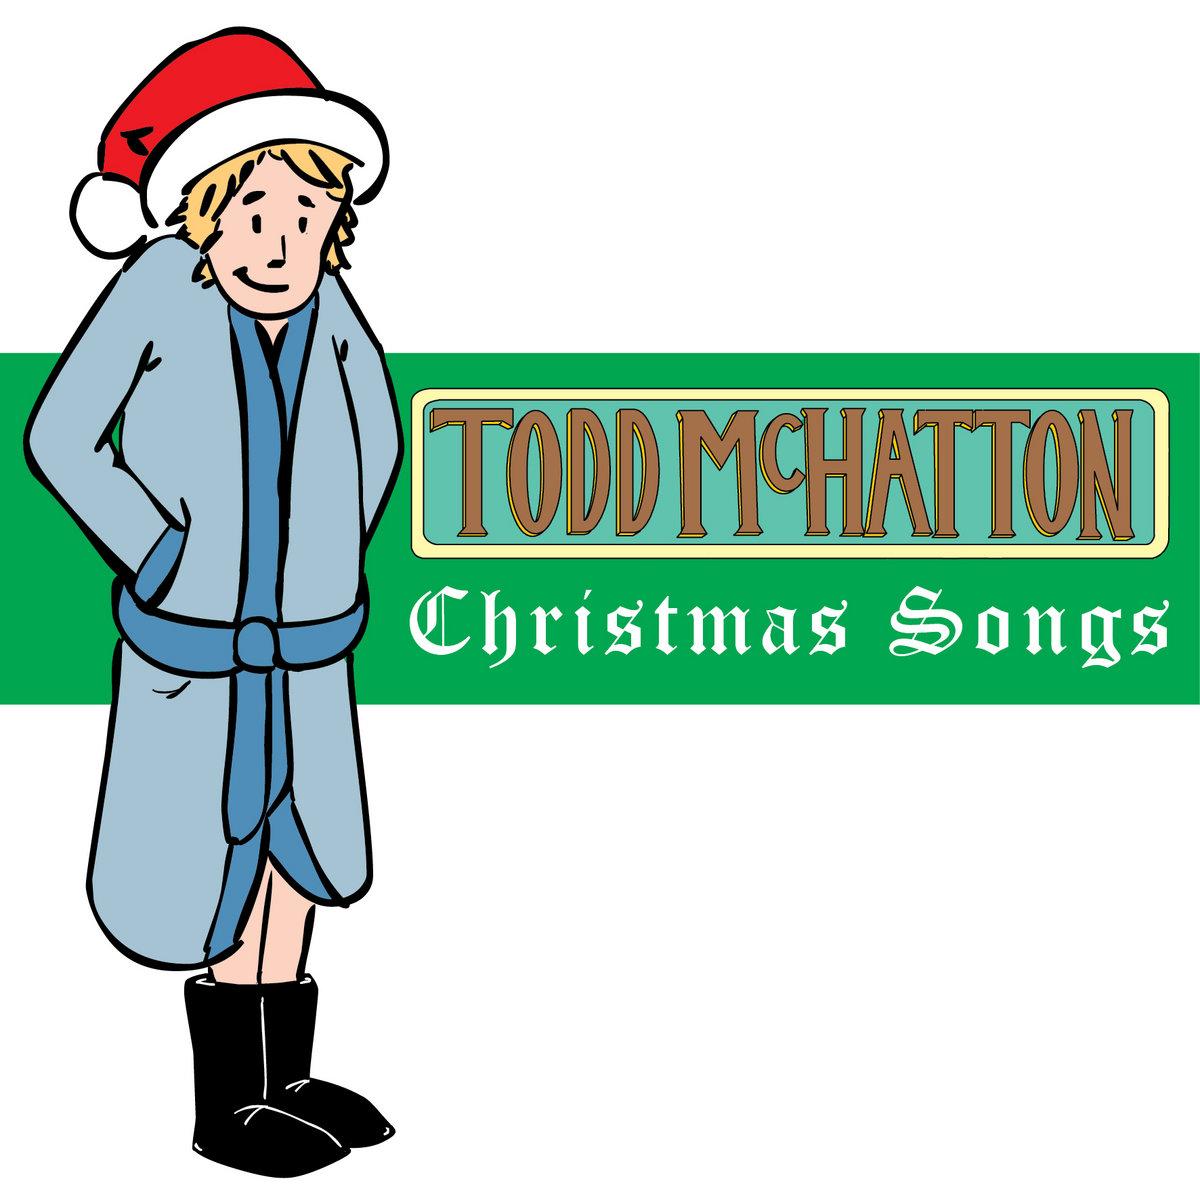 Christmas Songs | Todd McHatton